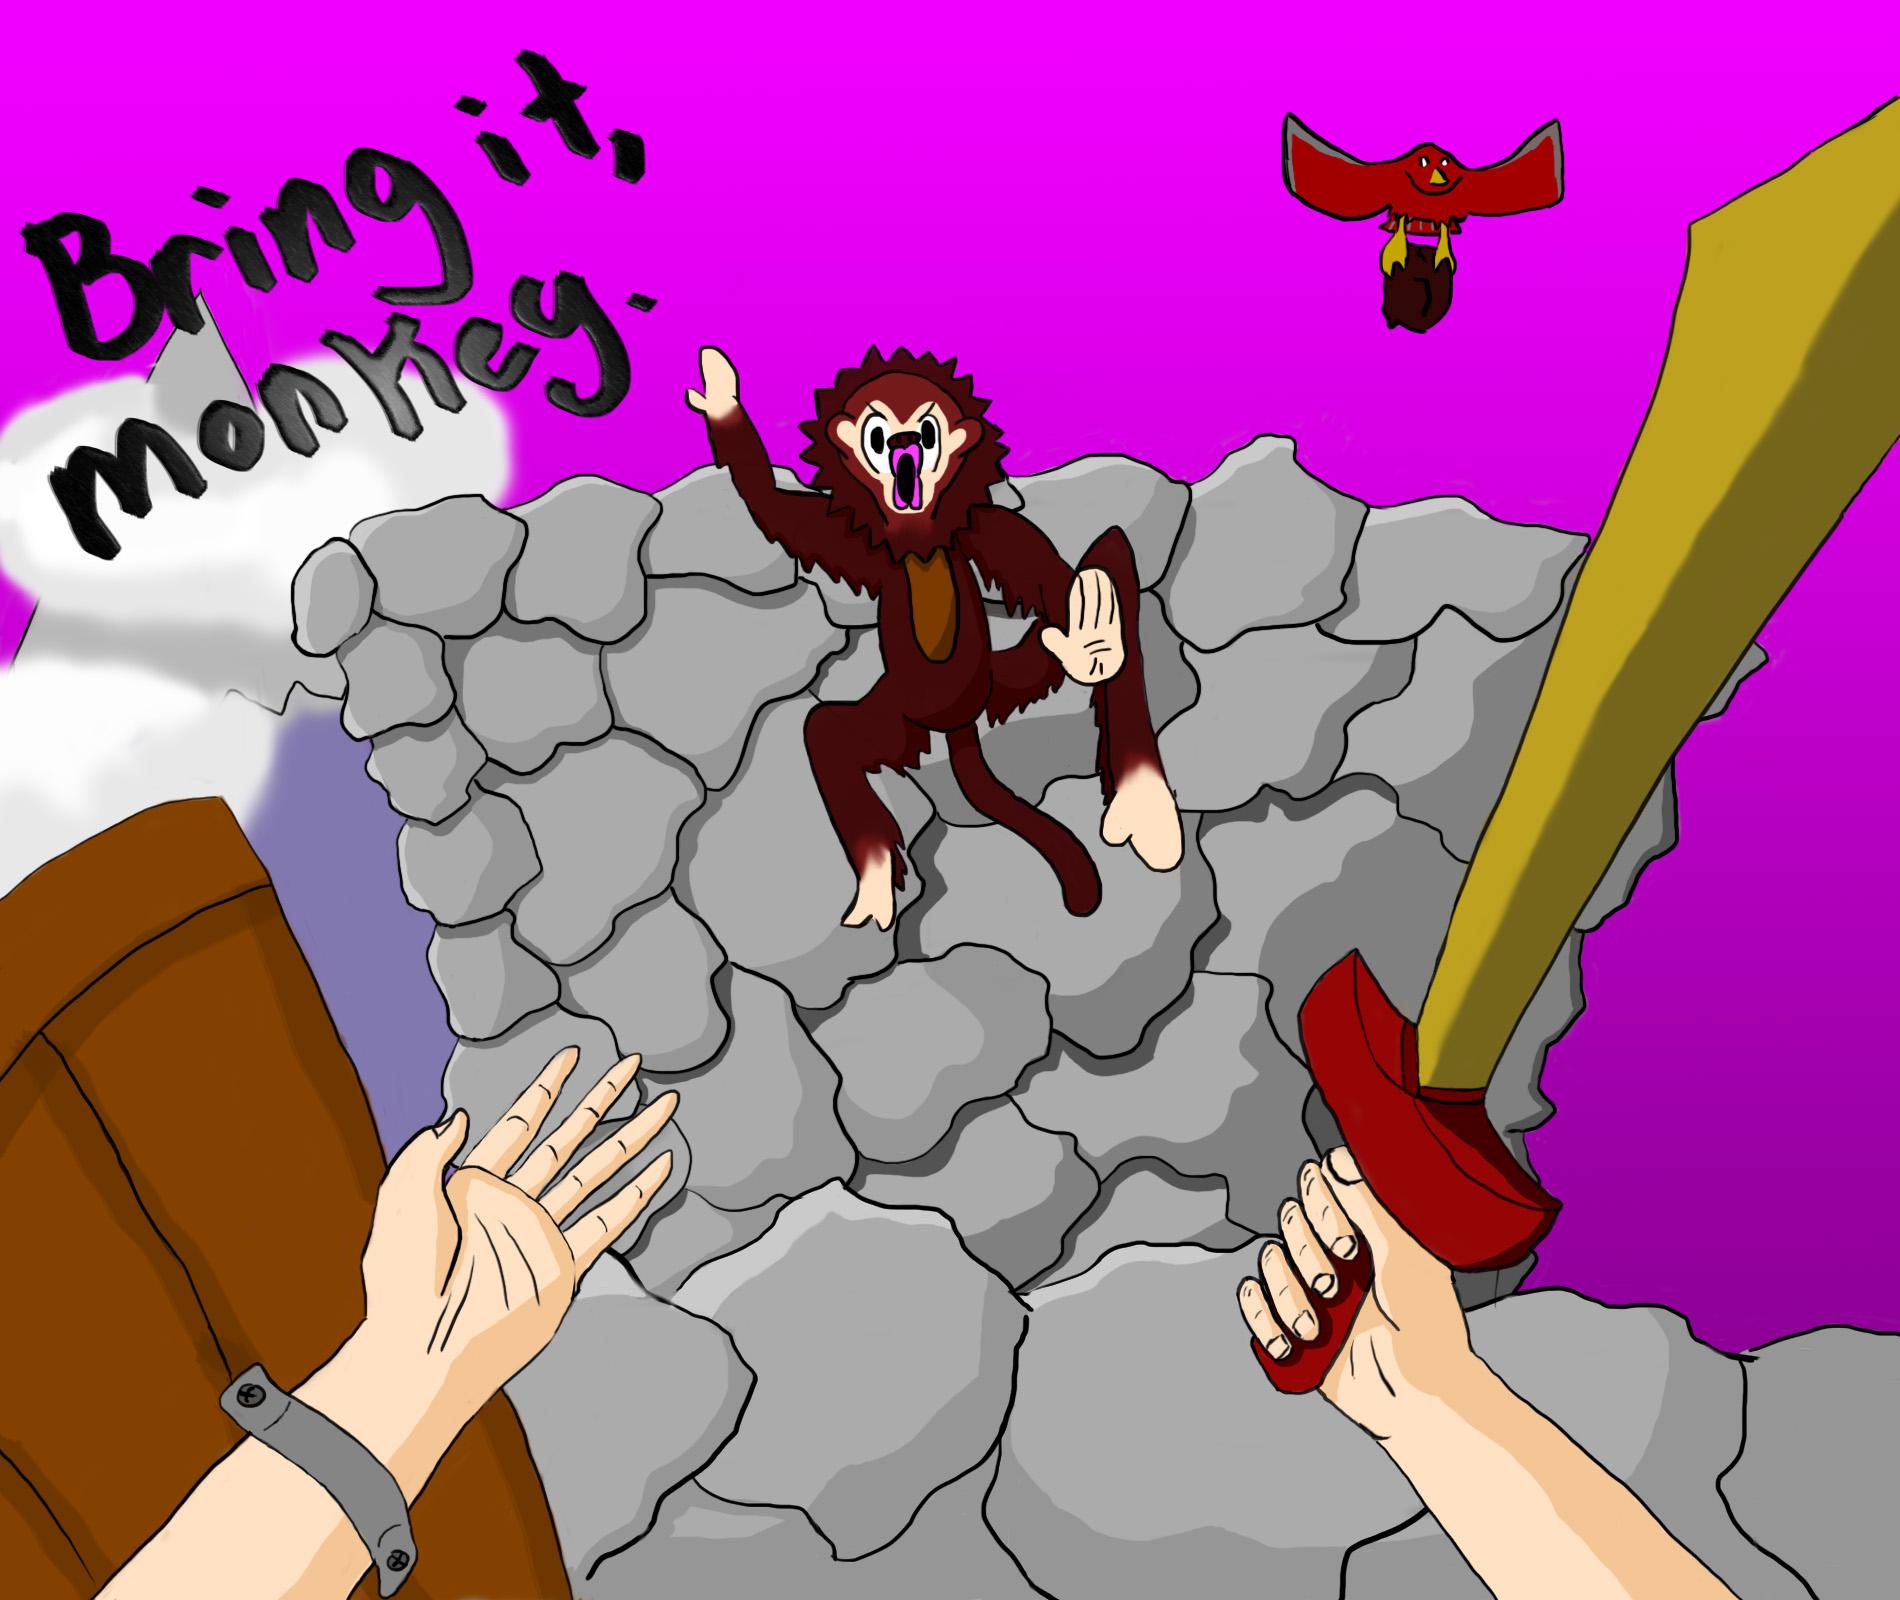 Bring it, Monkey.